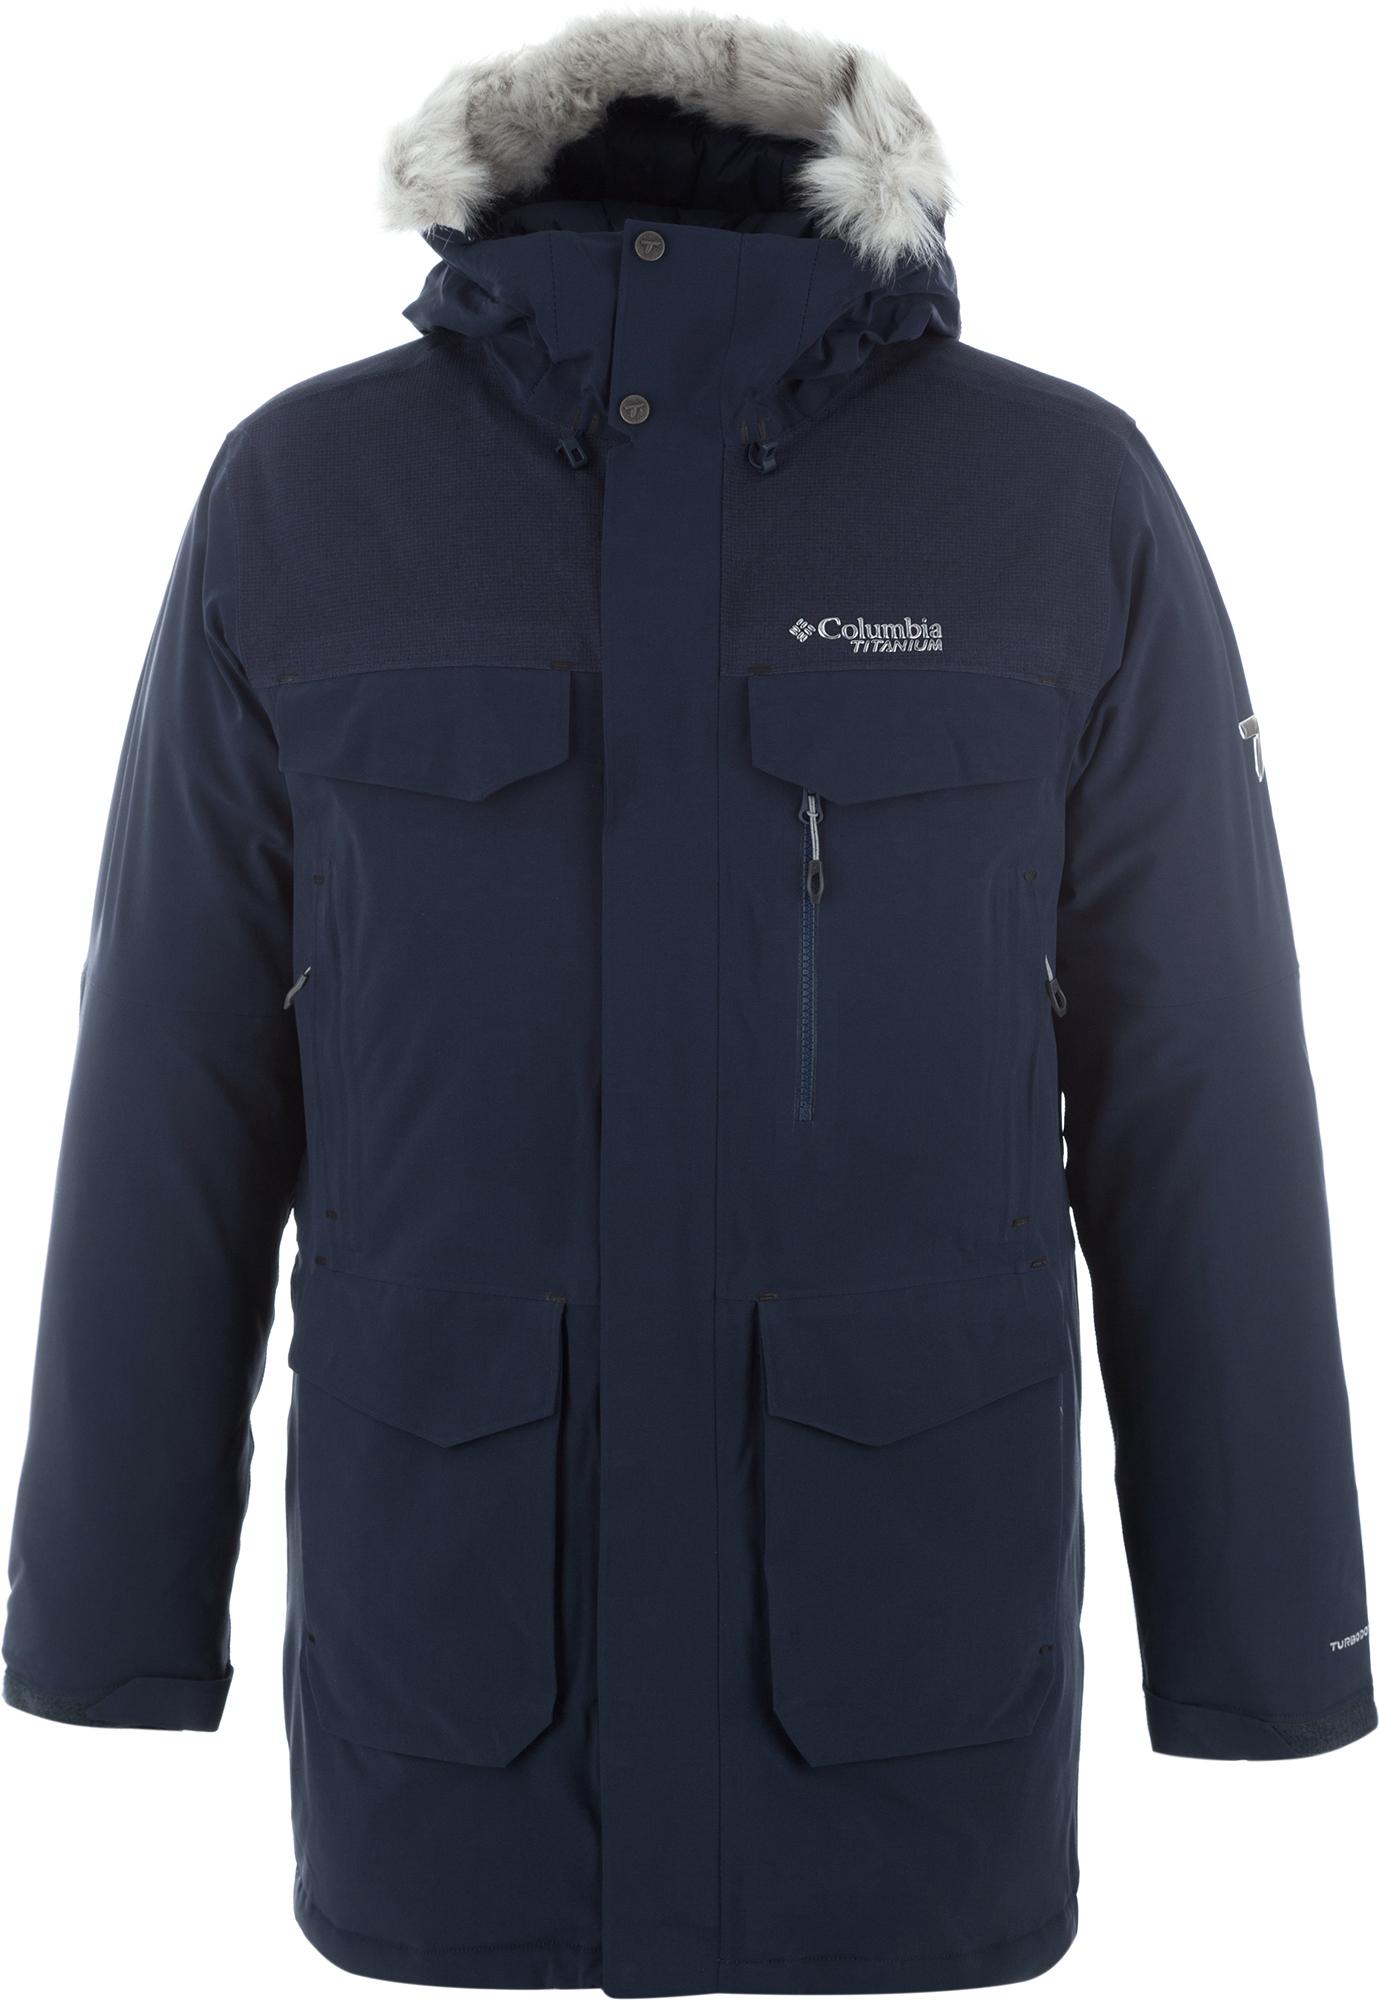 Columbia Куртка пуховая мужская Columbia Titan Pass 780 TurboDown куртка пуховая arctic goose куртка пуховая